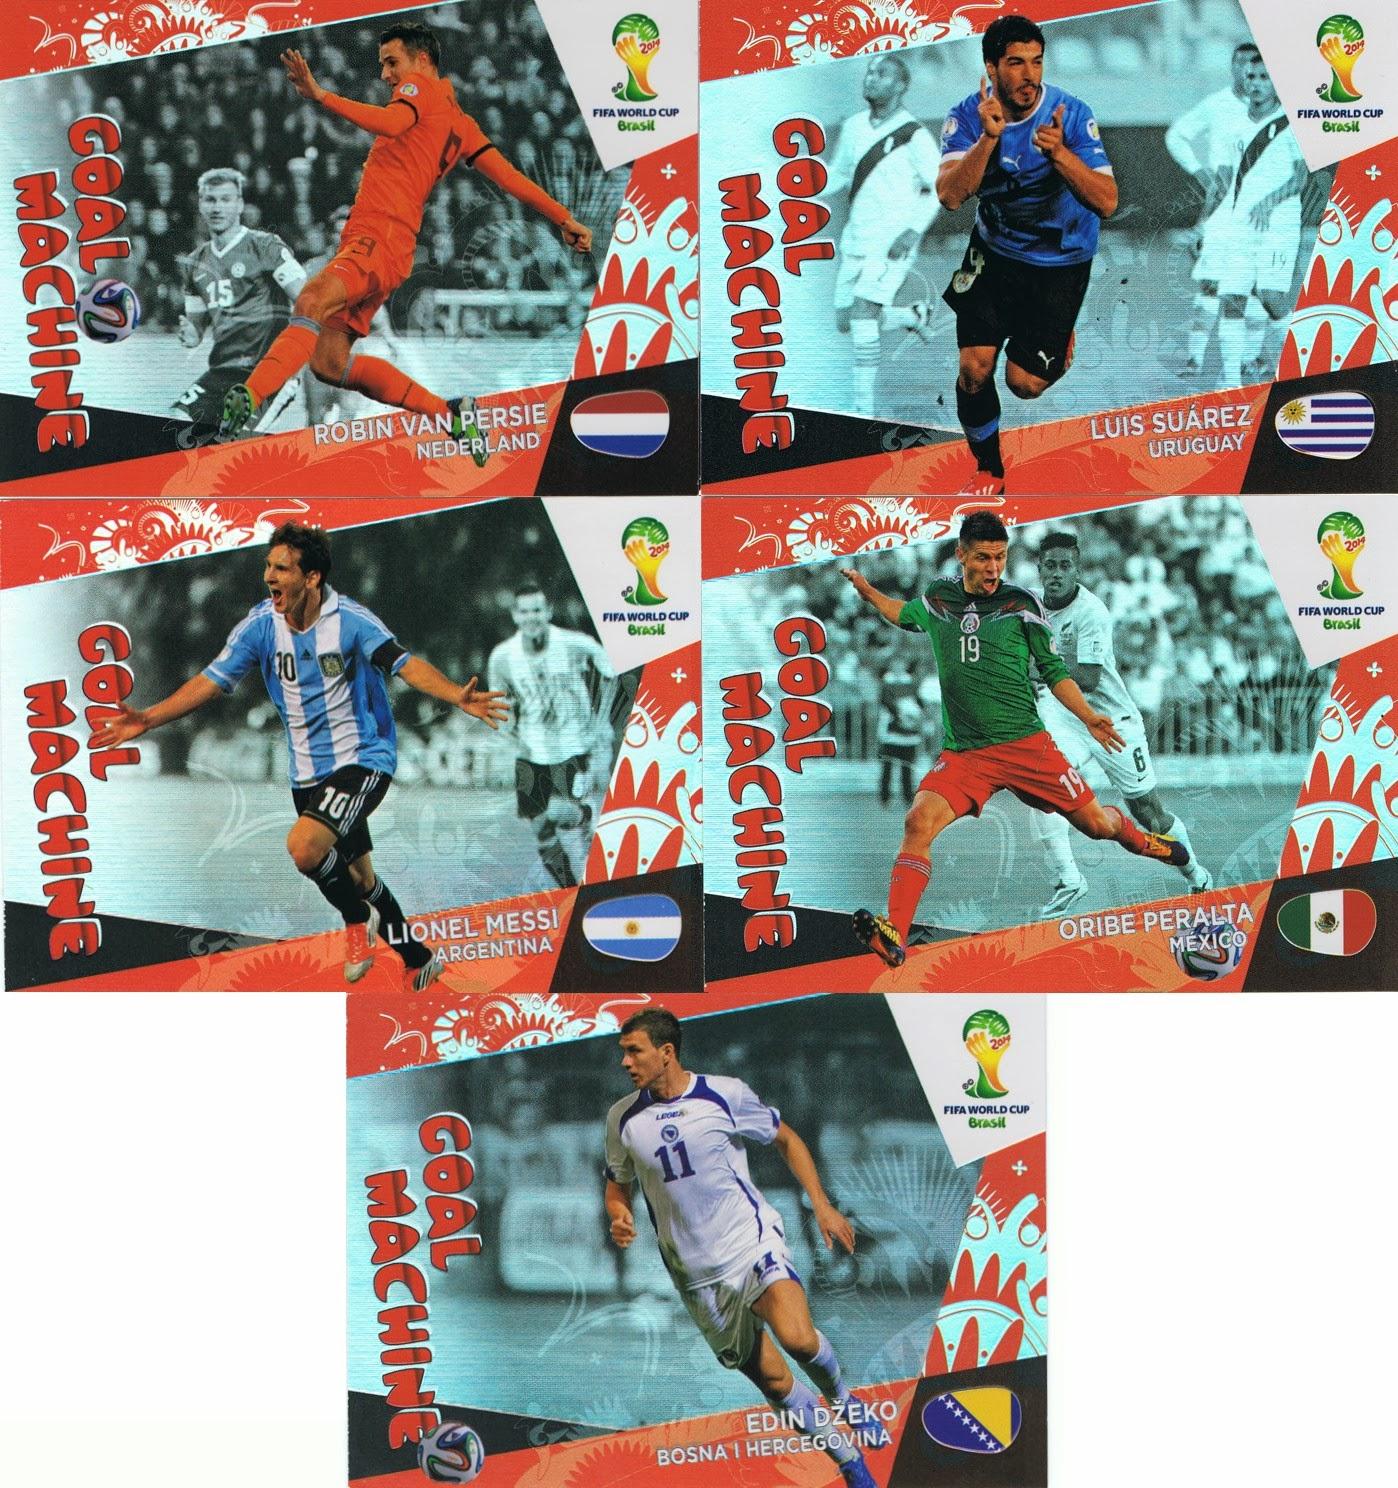 Fifa 2011 CRLP - Volume 2 download link is in description